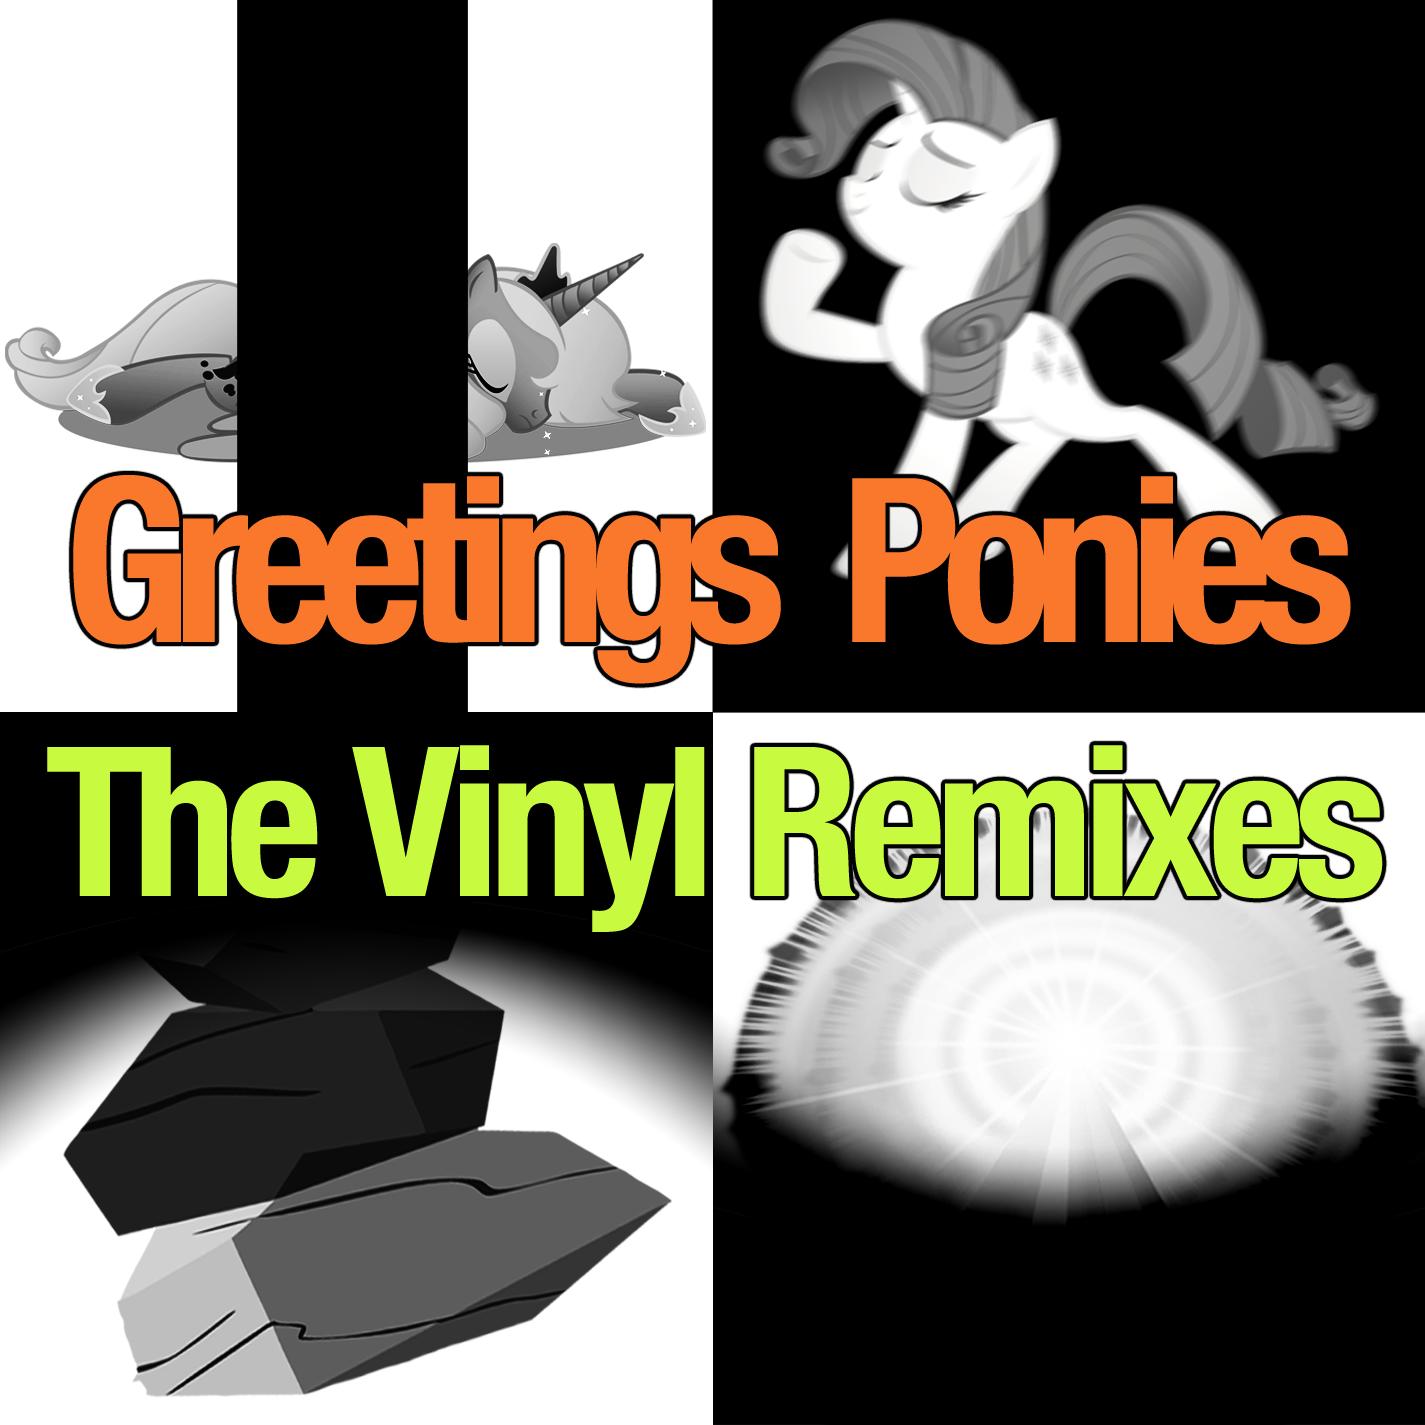 49647 - album cover, artist:skeptic-mousey, parody, poster, princess